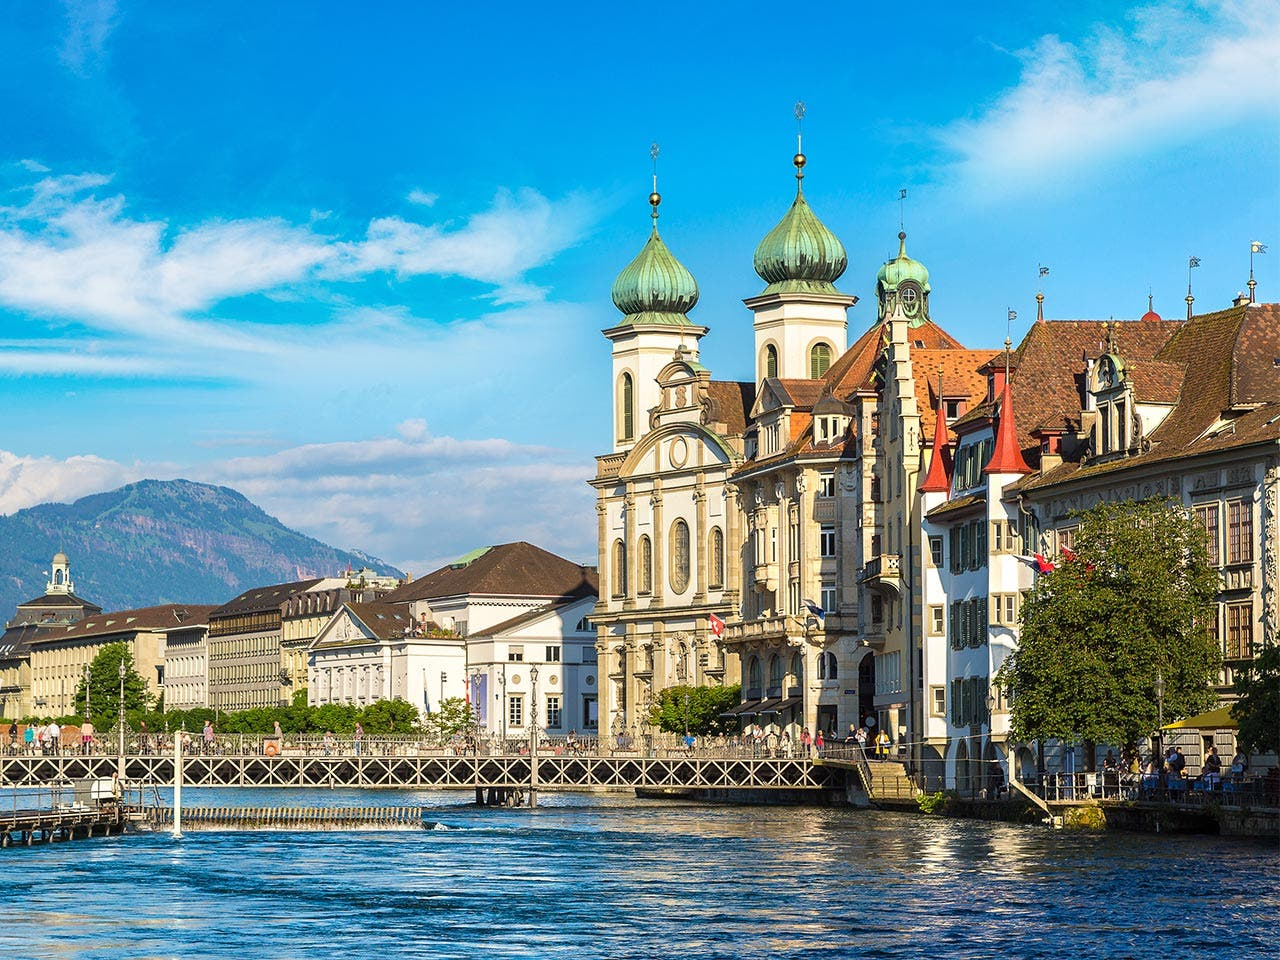 Switzerland | S-F/Shutterstock.com